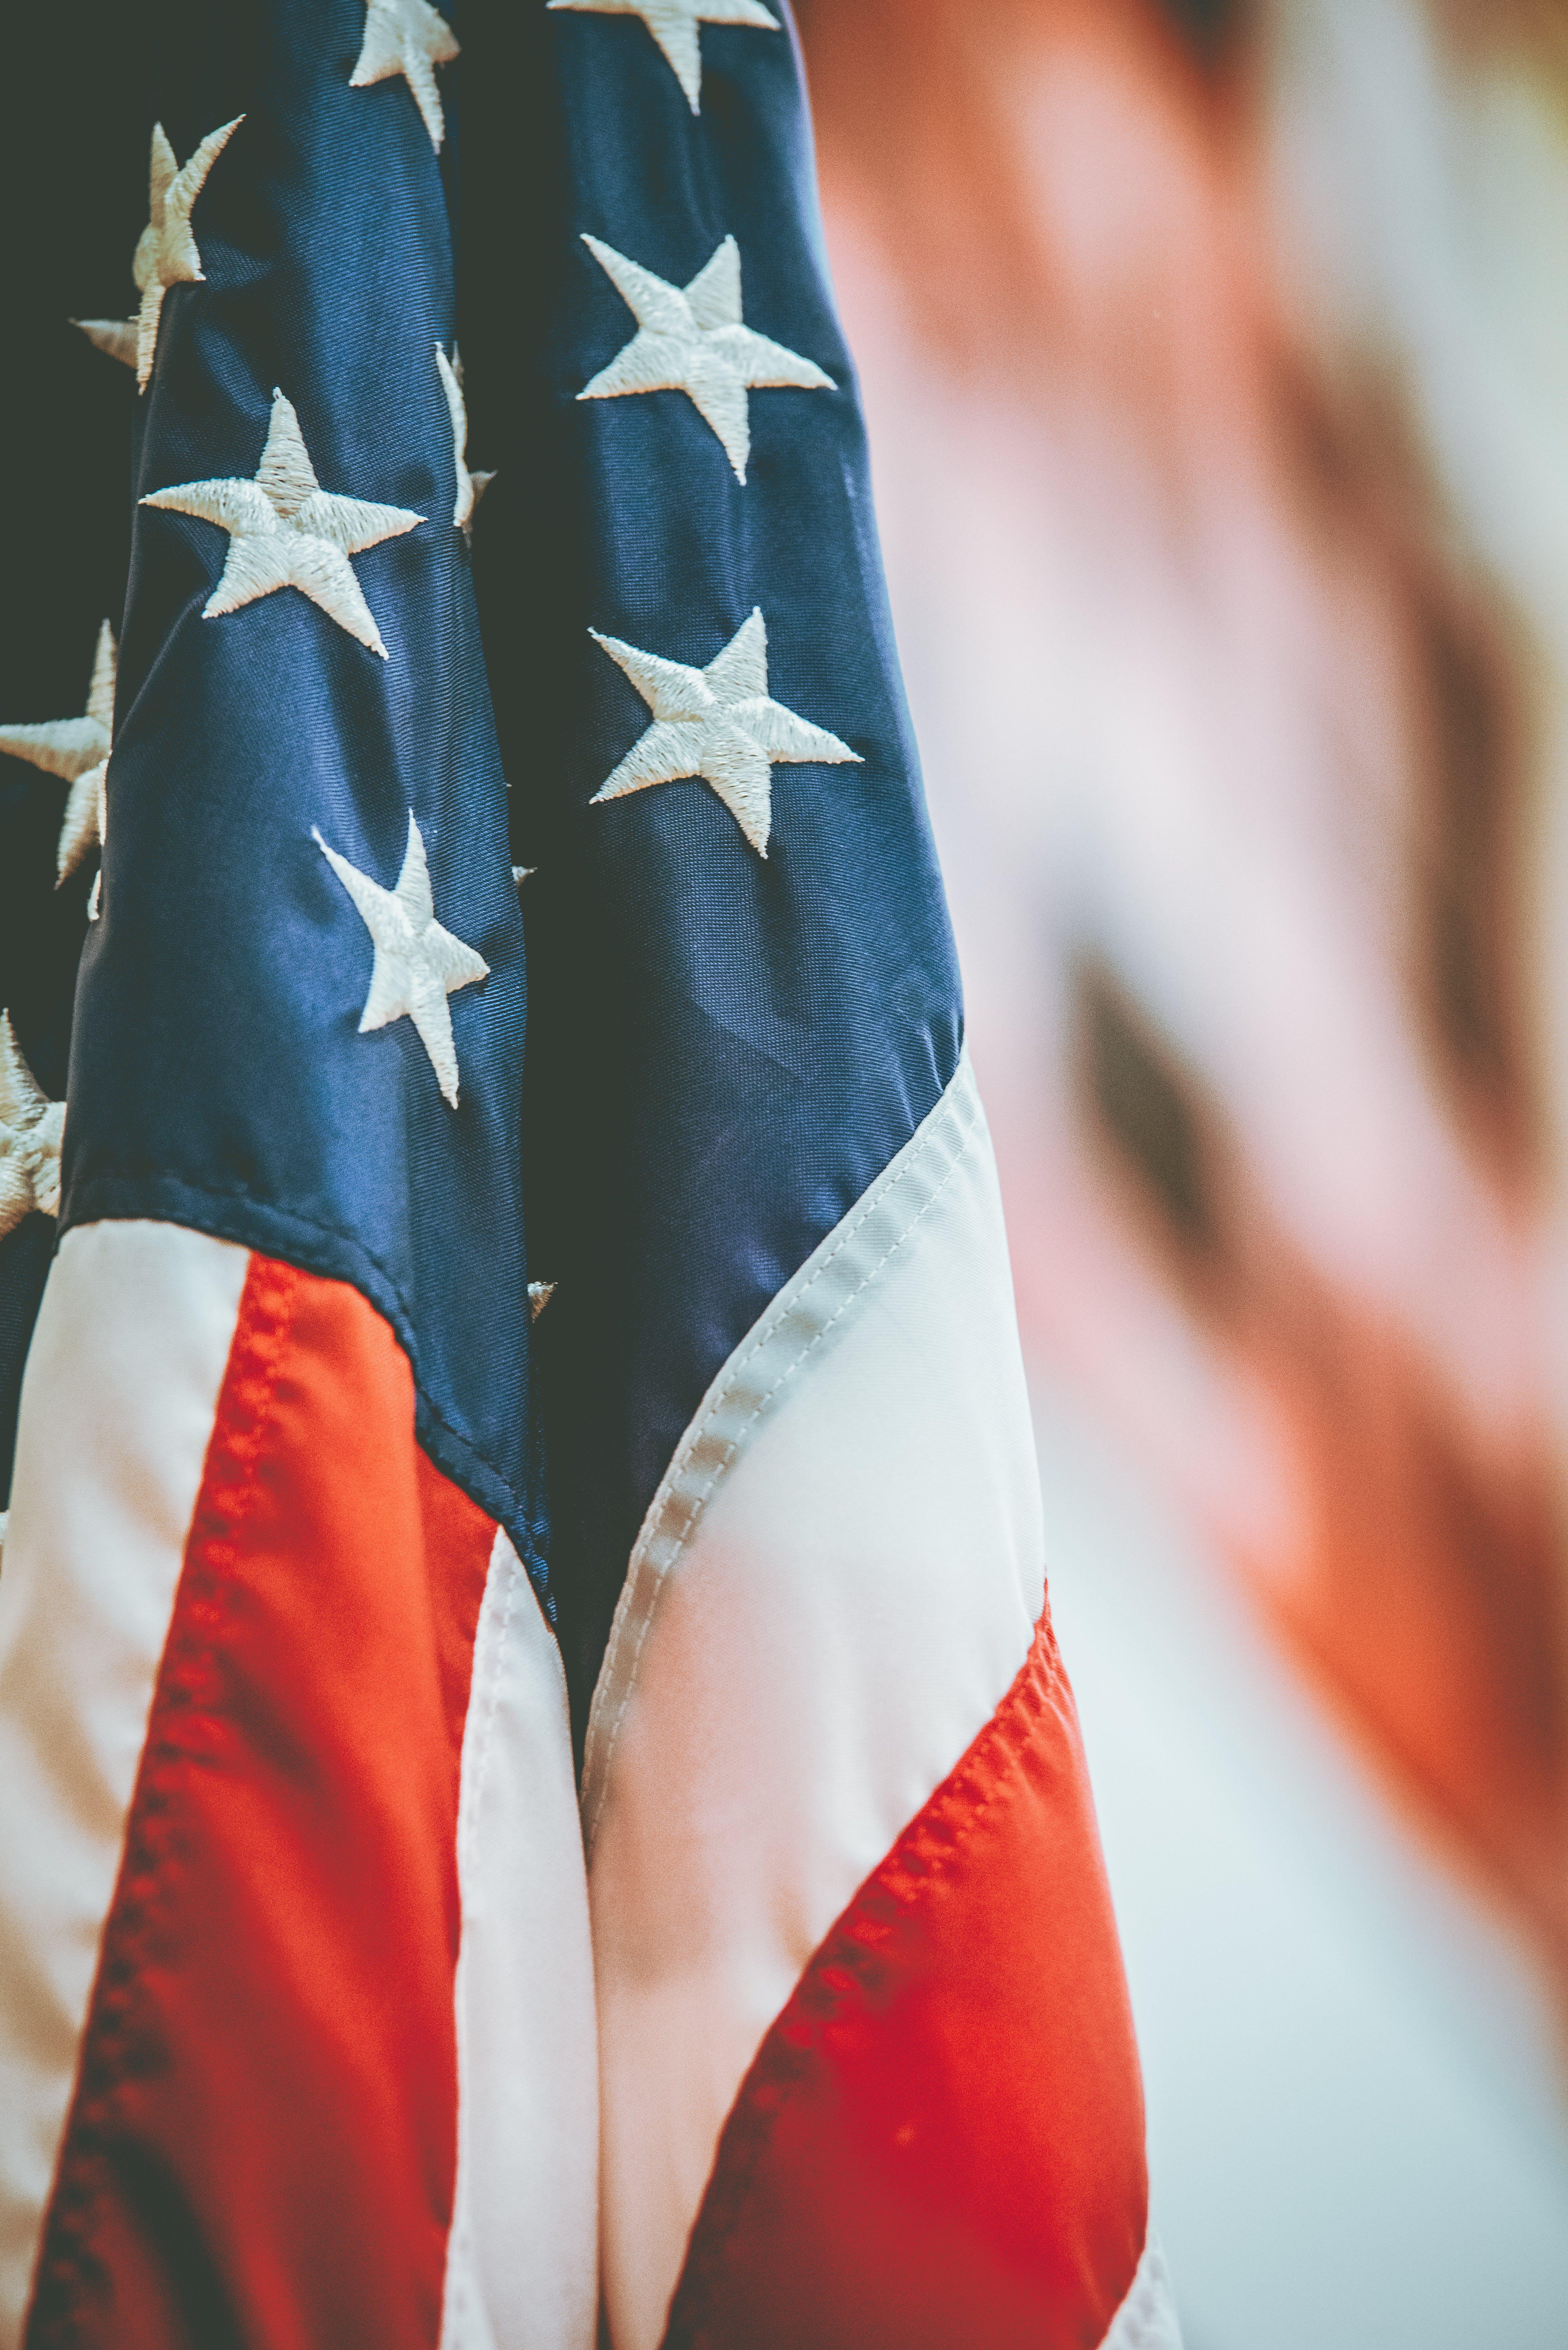 Kostenloses Stock Foto zu amerika, amerikanische flagge, demokratie, flagge